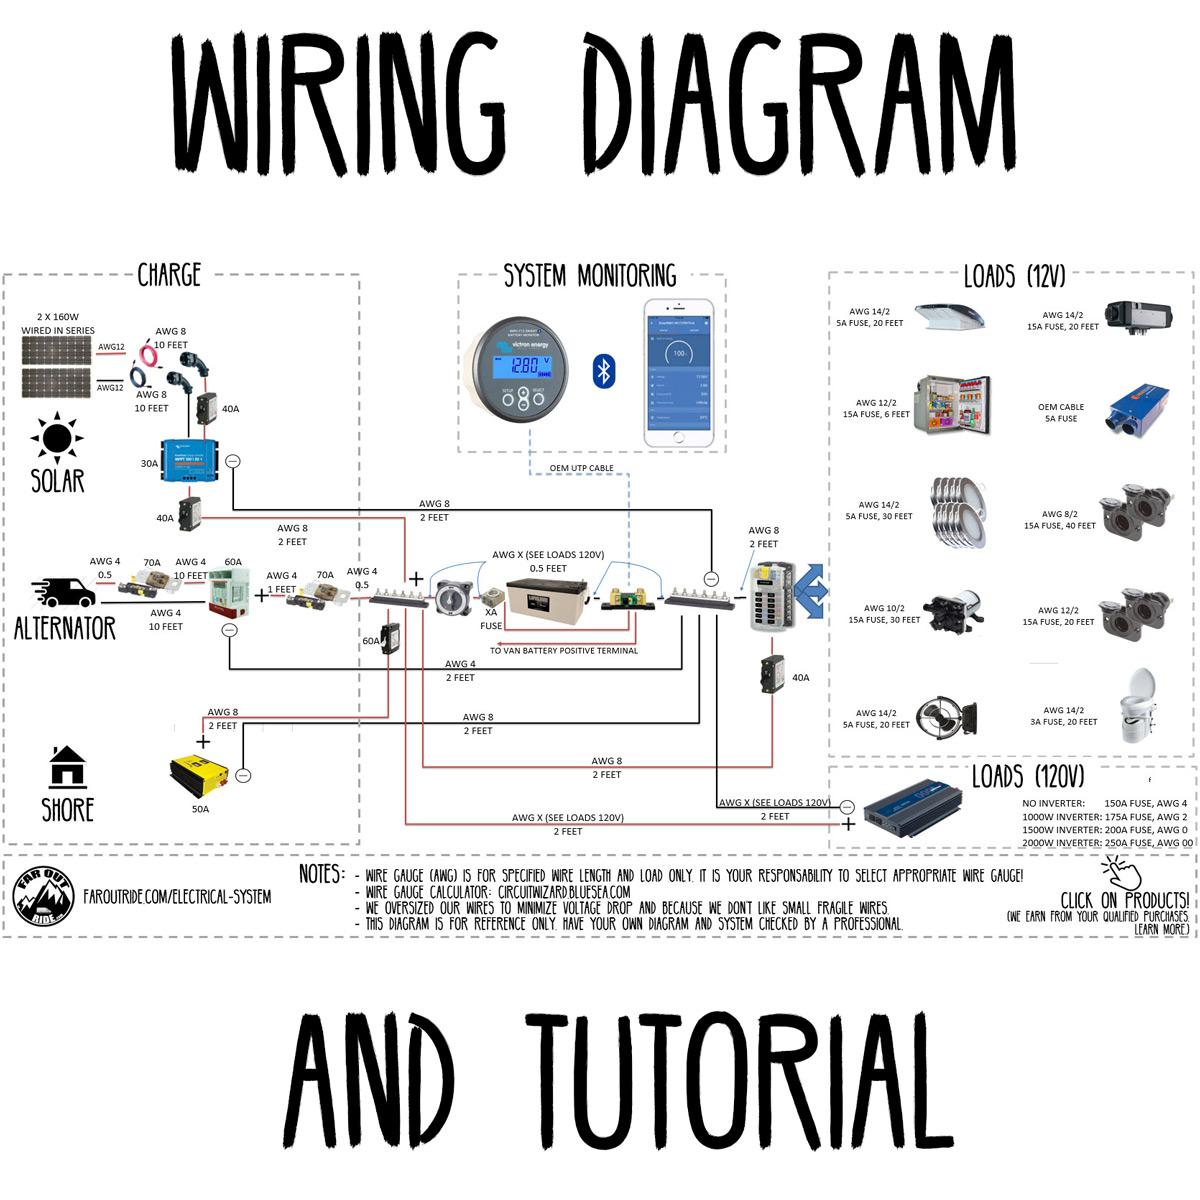 logitech g25 pedal wiring diagram photo by garyhope photobucket rh sellfie co